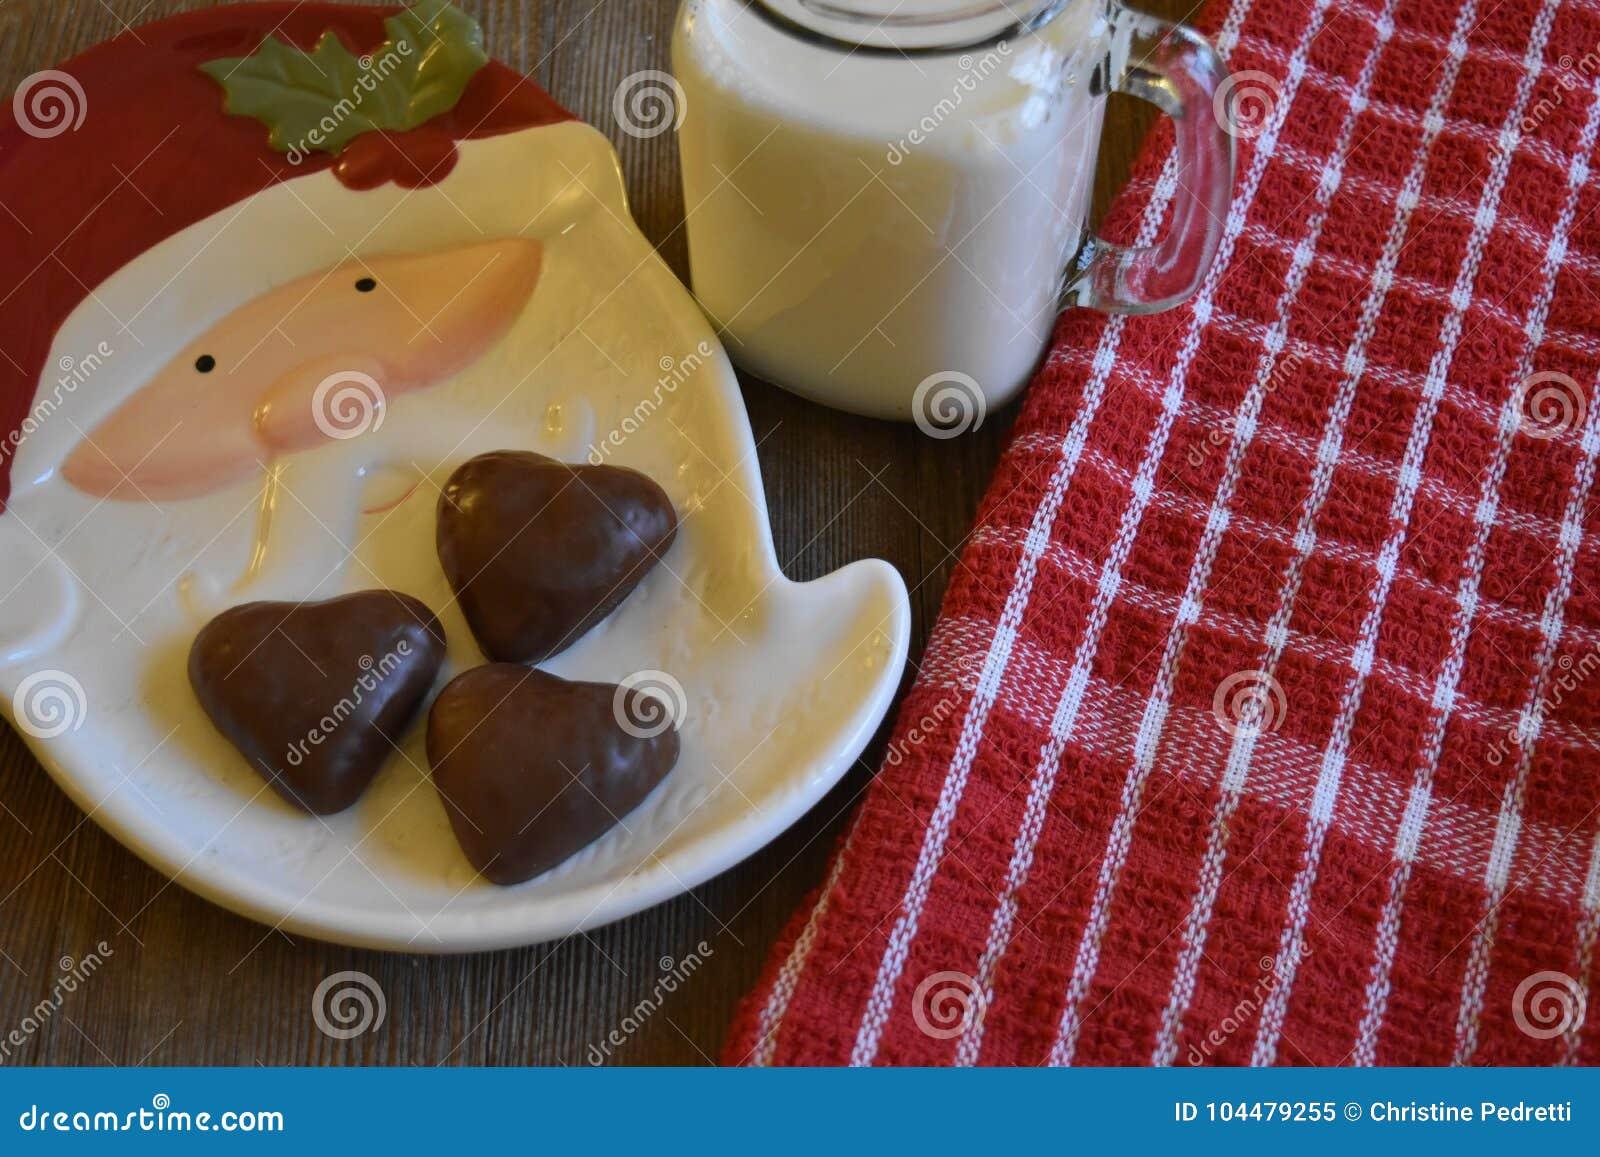 Cookies And Milk For Santa Stock Image Image Of Santa 104479255